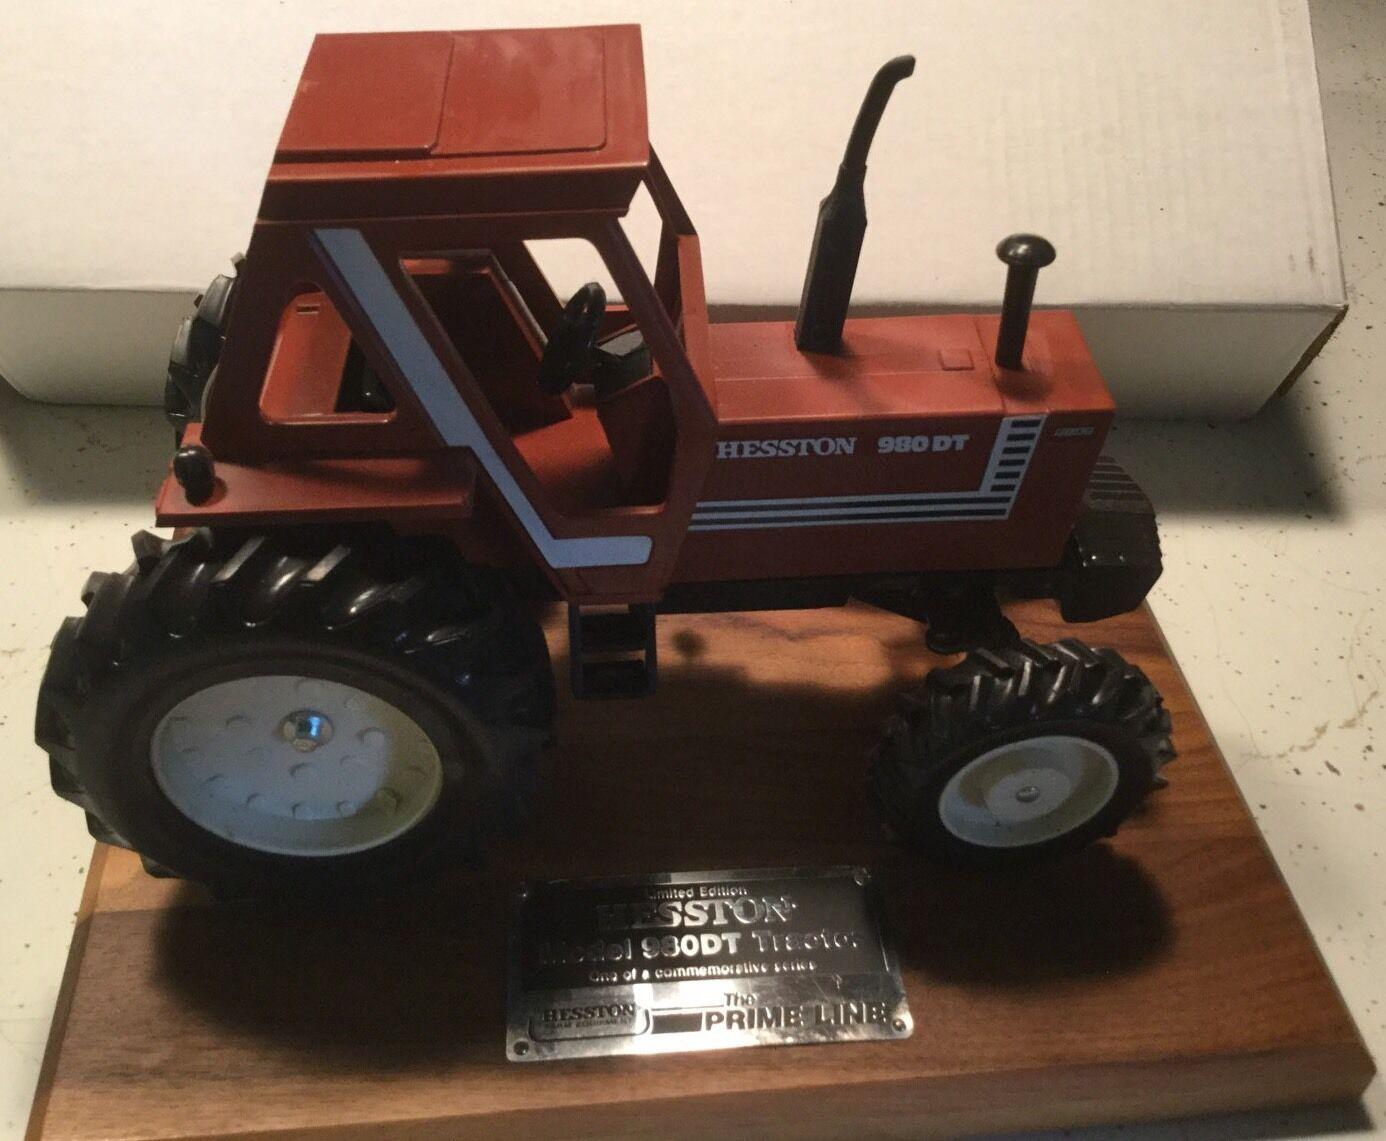 Hesston Fiat Model 980DT. 4-Wheel Drive Commemorative Model Tractor